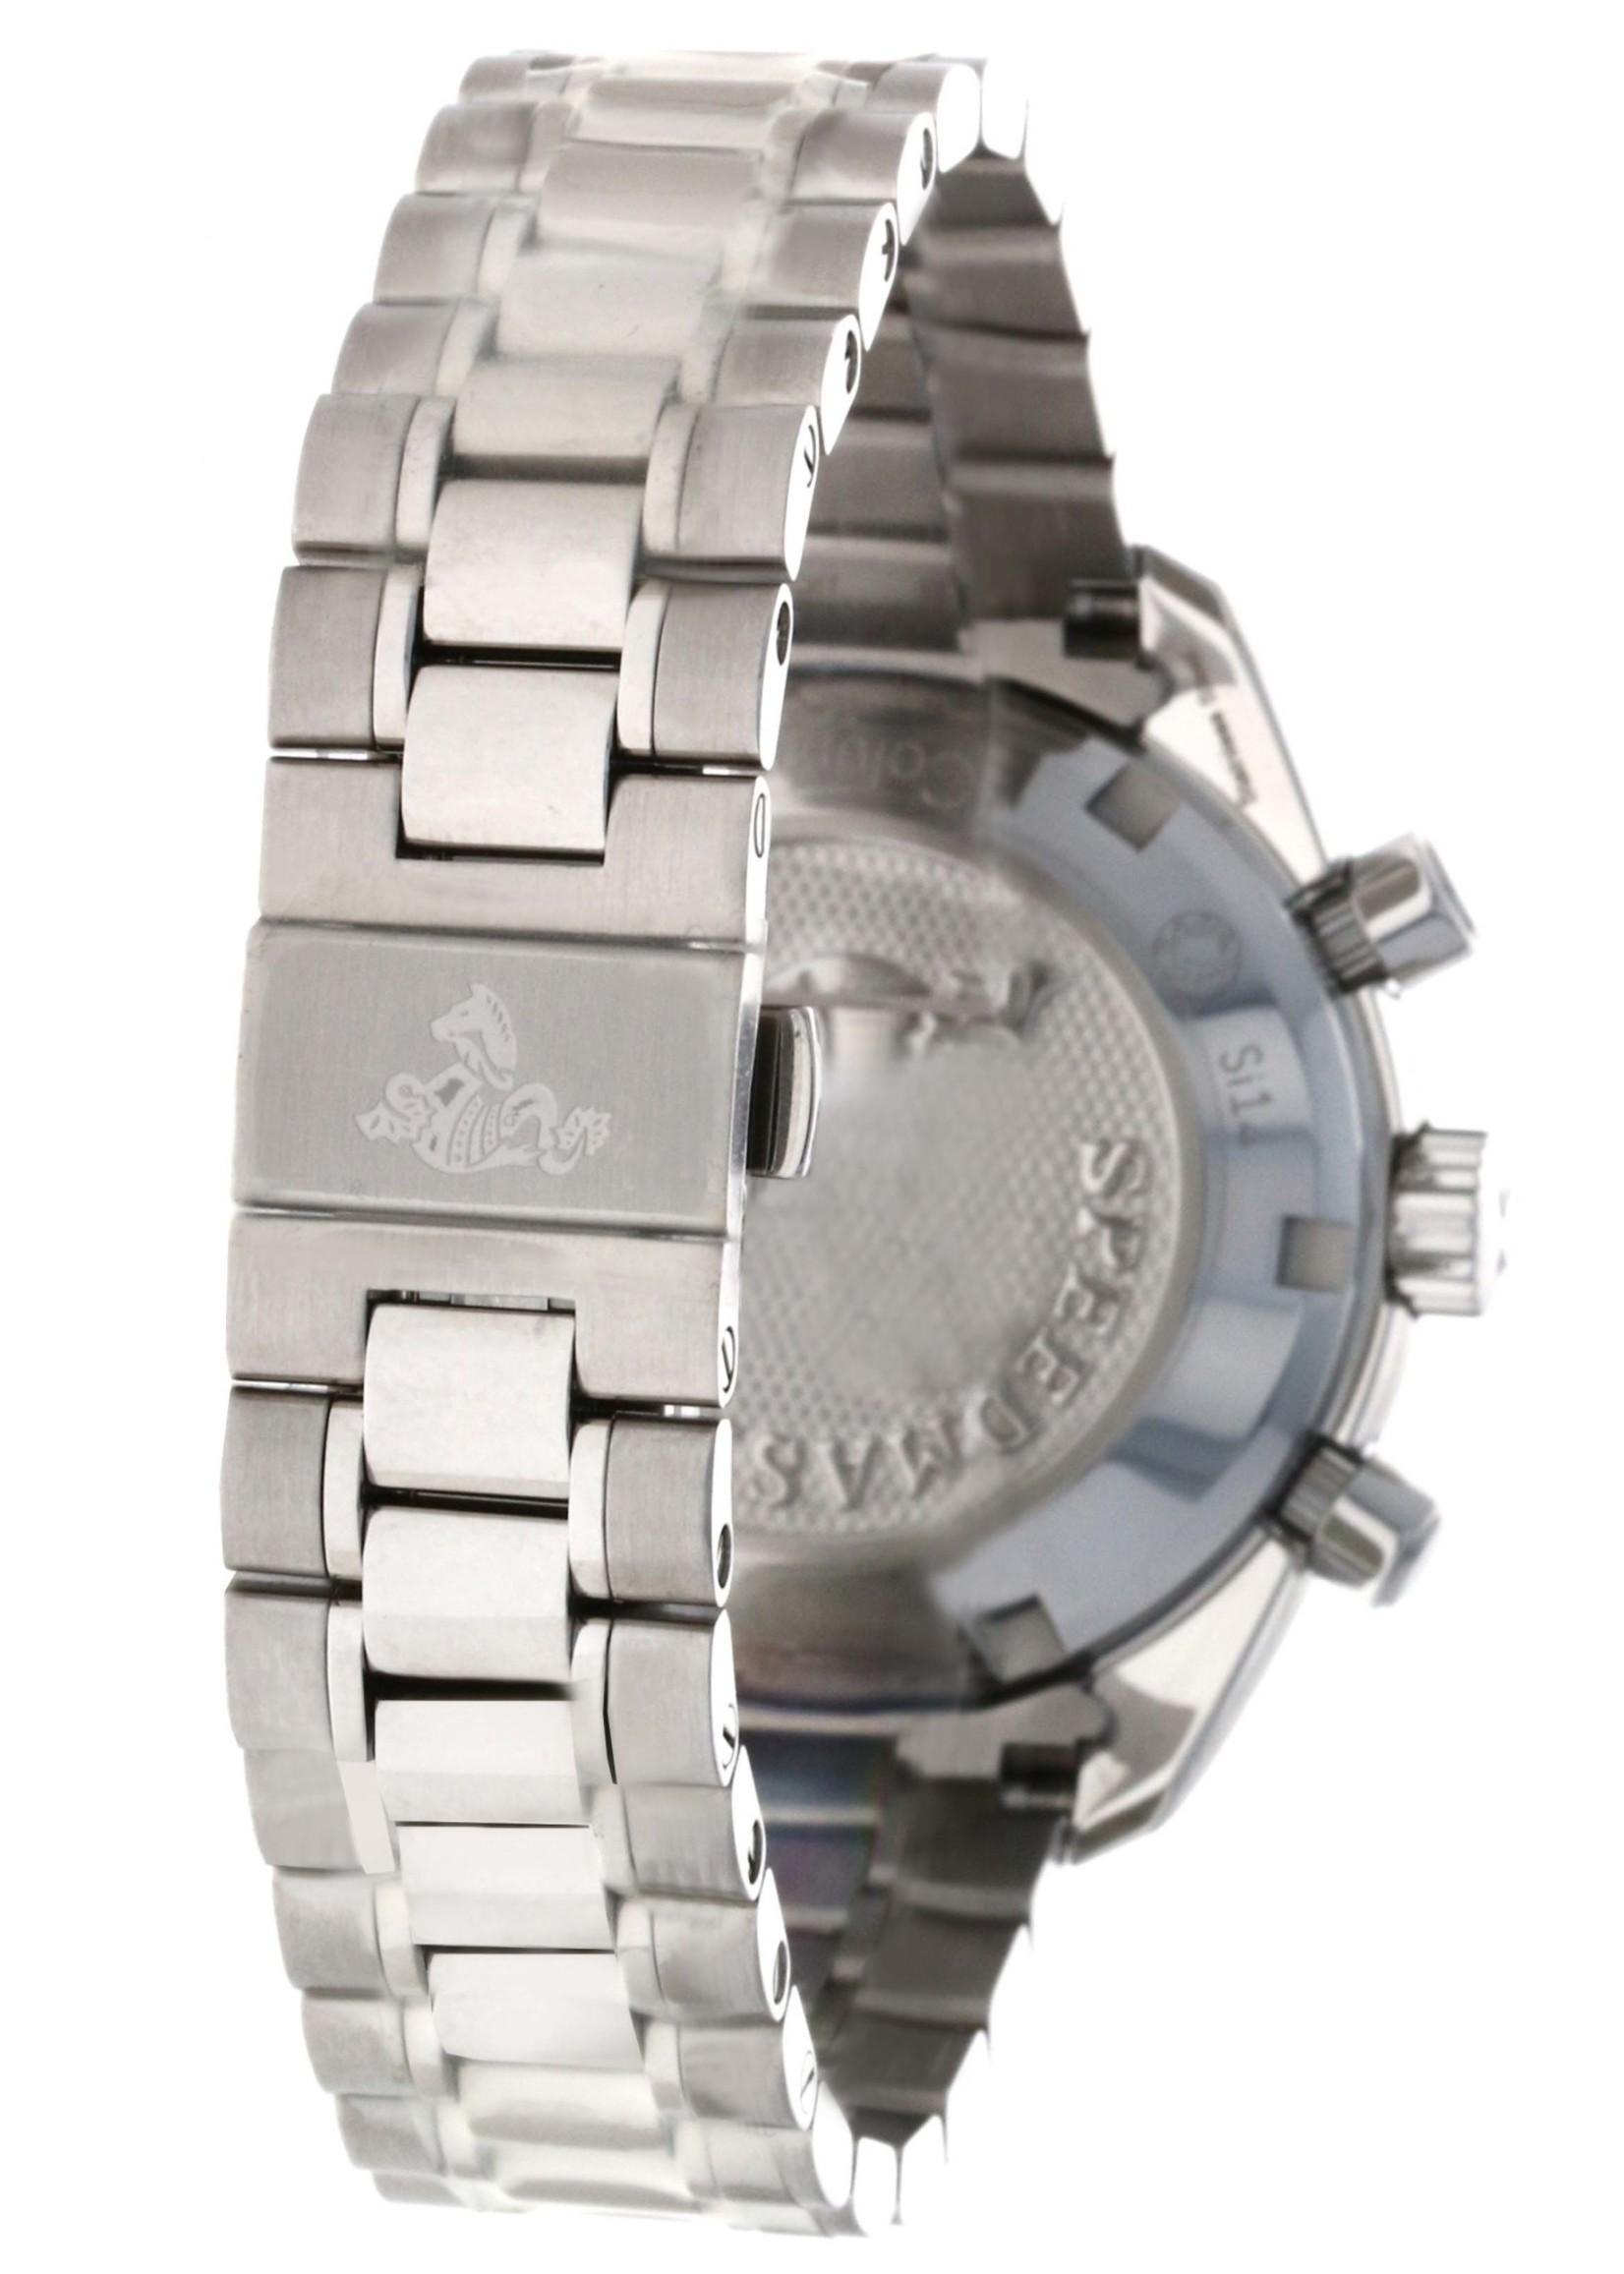 Omega Watches OMEGA SPEEDMASTER 38MM (2019 B+P)